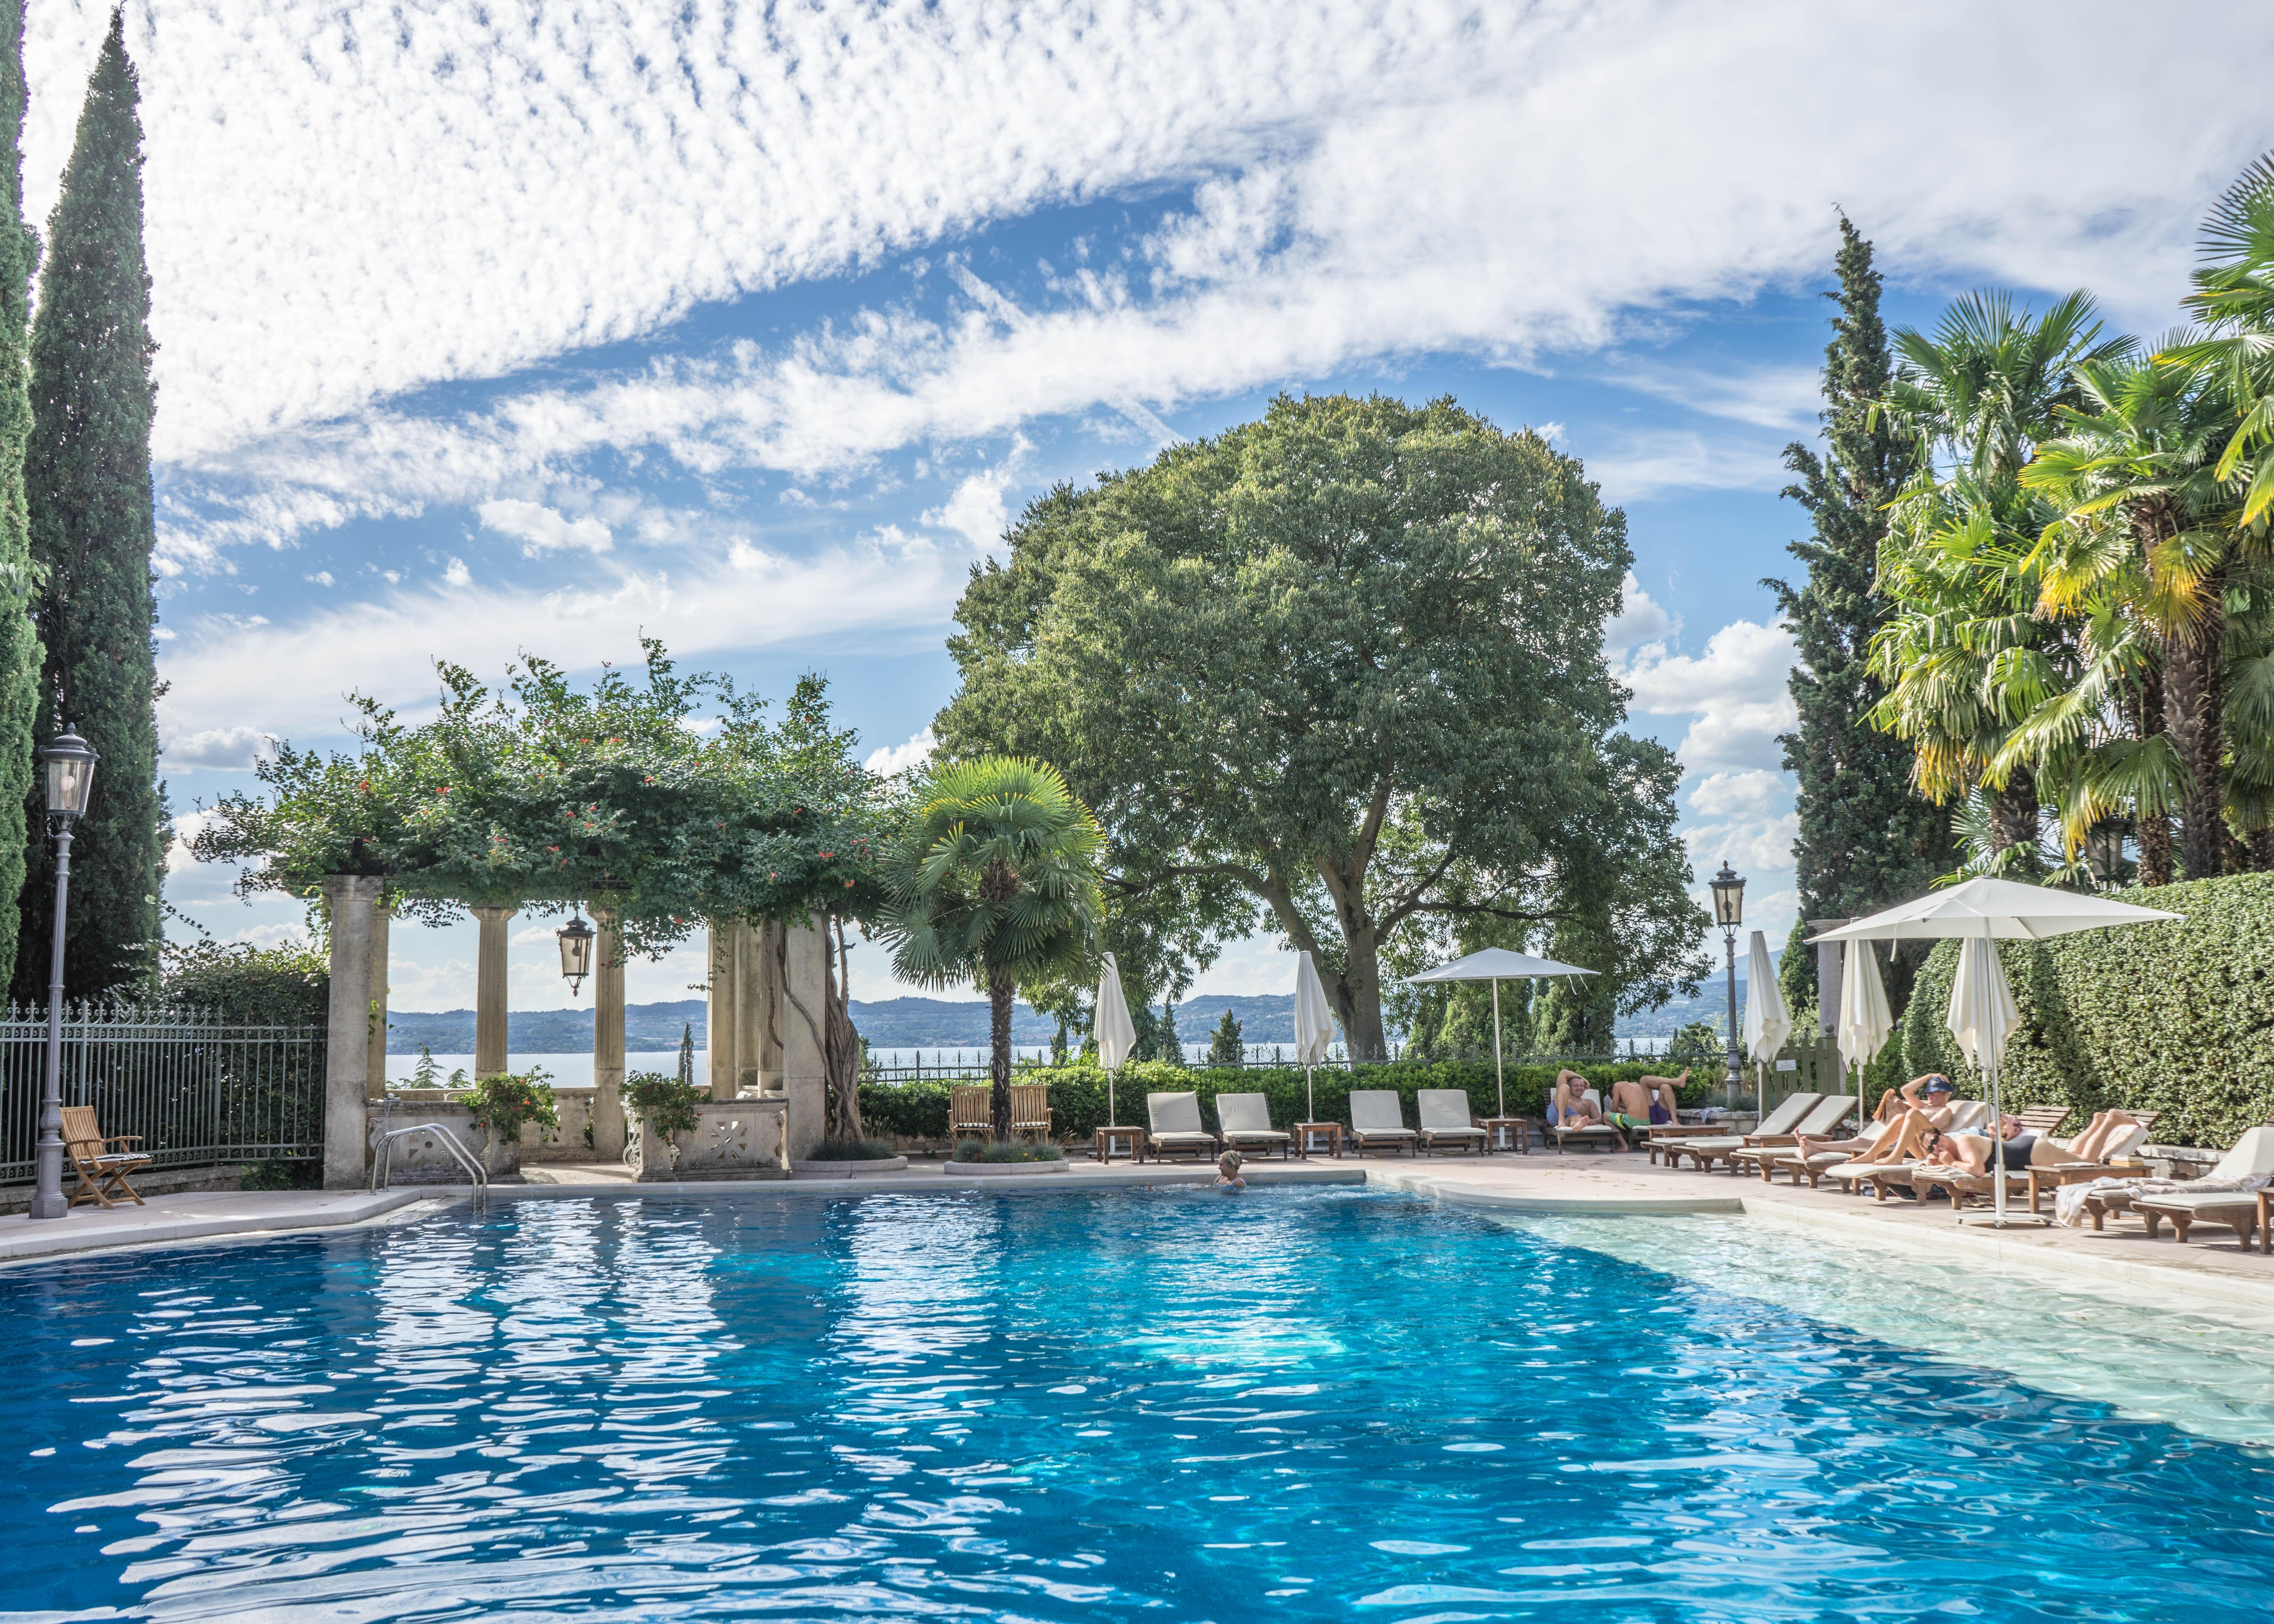 Margi, Best hotels in Athens